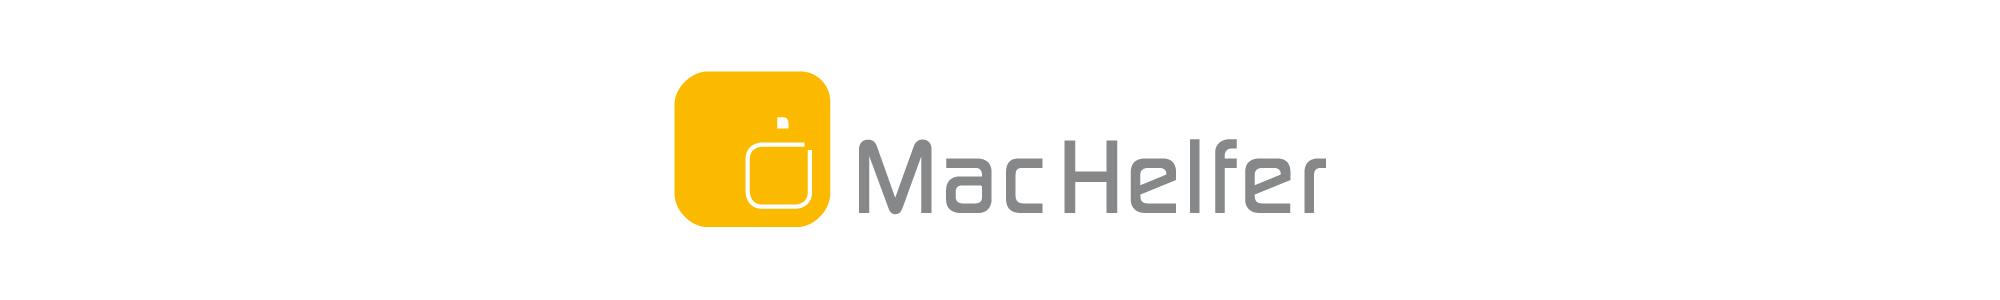 MacHelfer ®